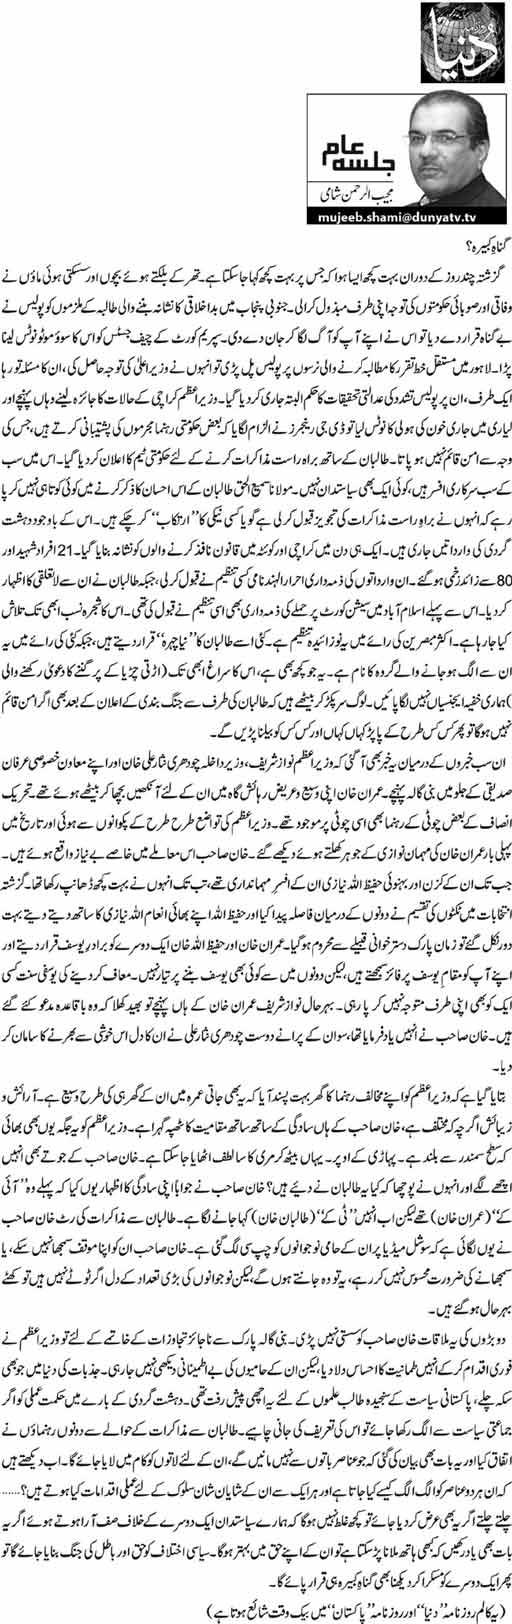 Gunah e Kabira - Mujeeb ur Rehman Shami